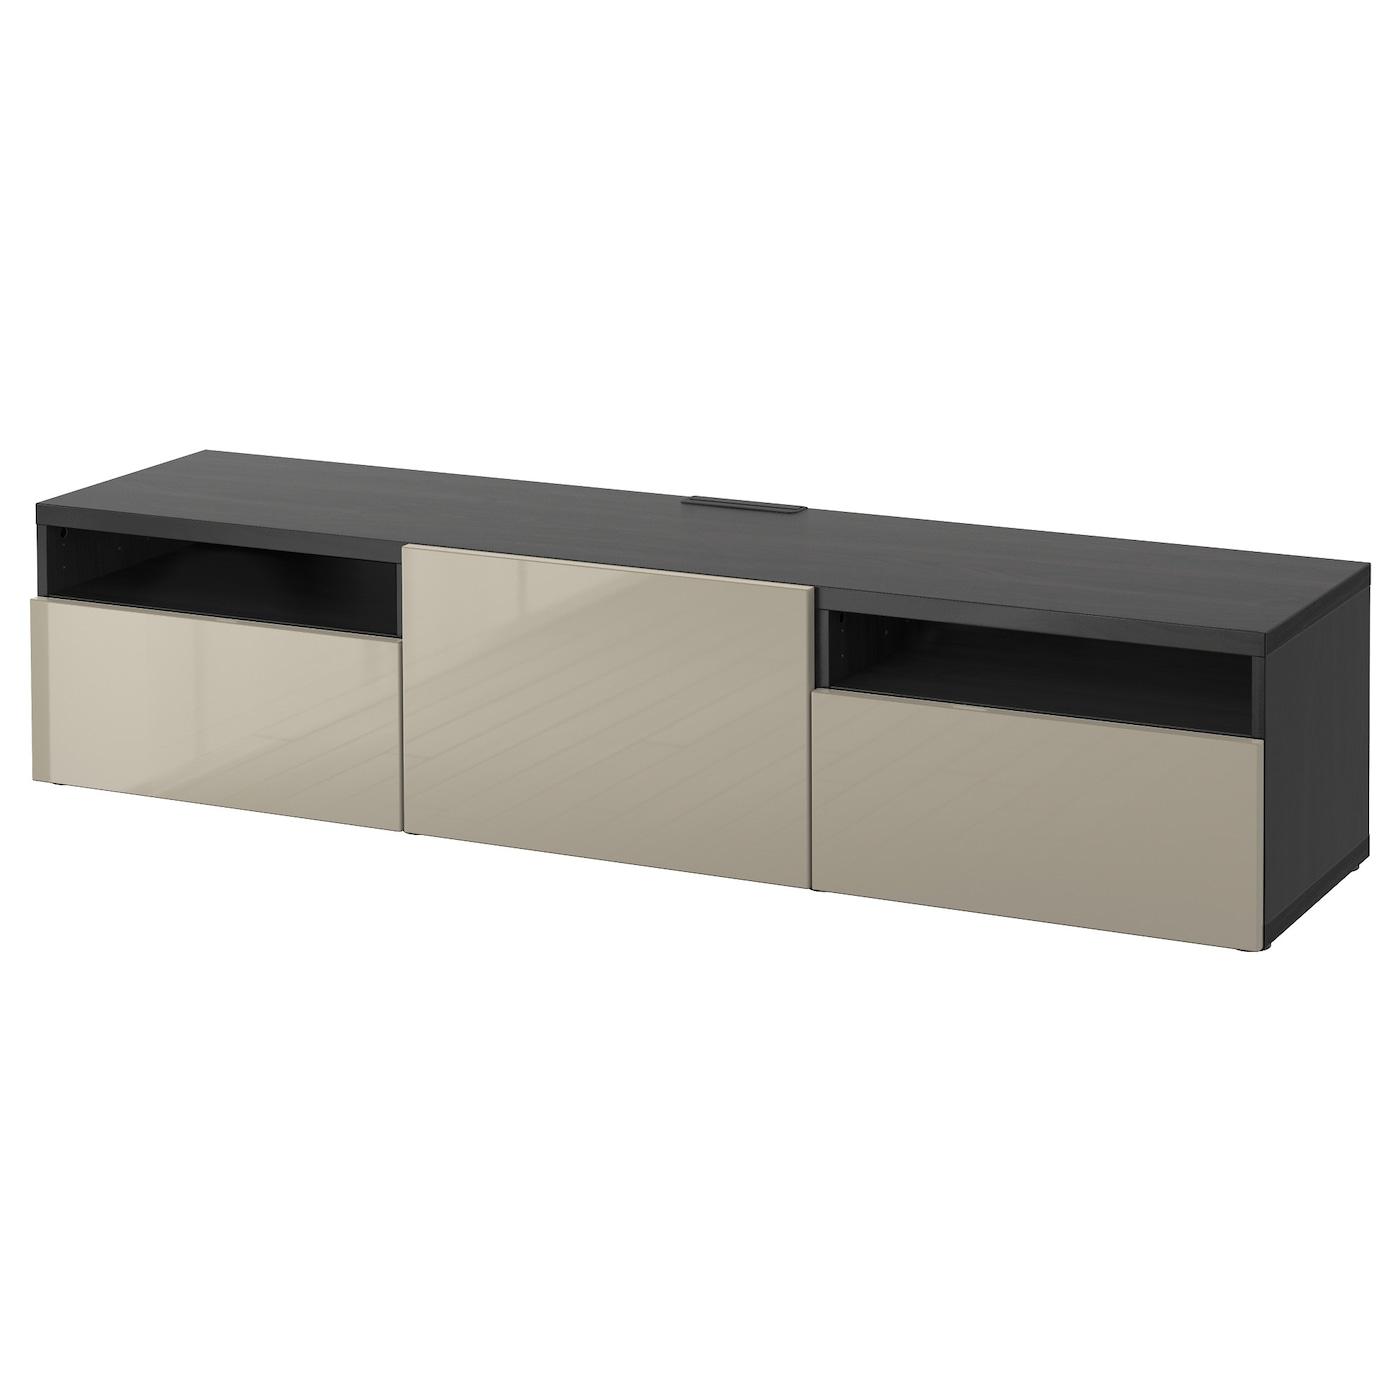 best tv bench black brown selsviken high gloss beige 180x40x38 cm ikea. Black Bedroom Furniture Sets. Home Design Ideas